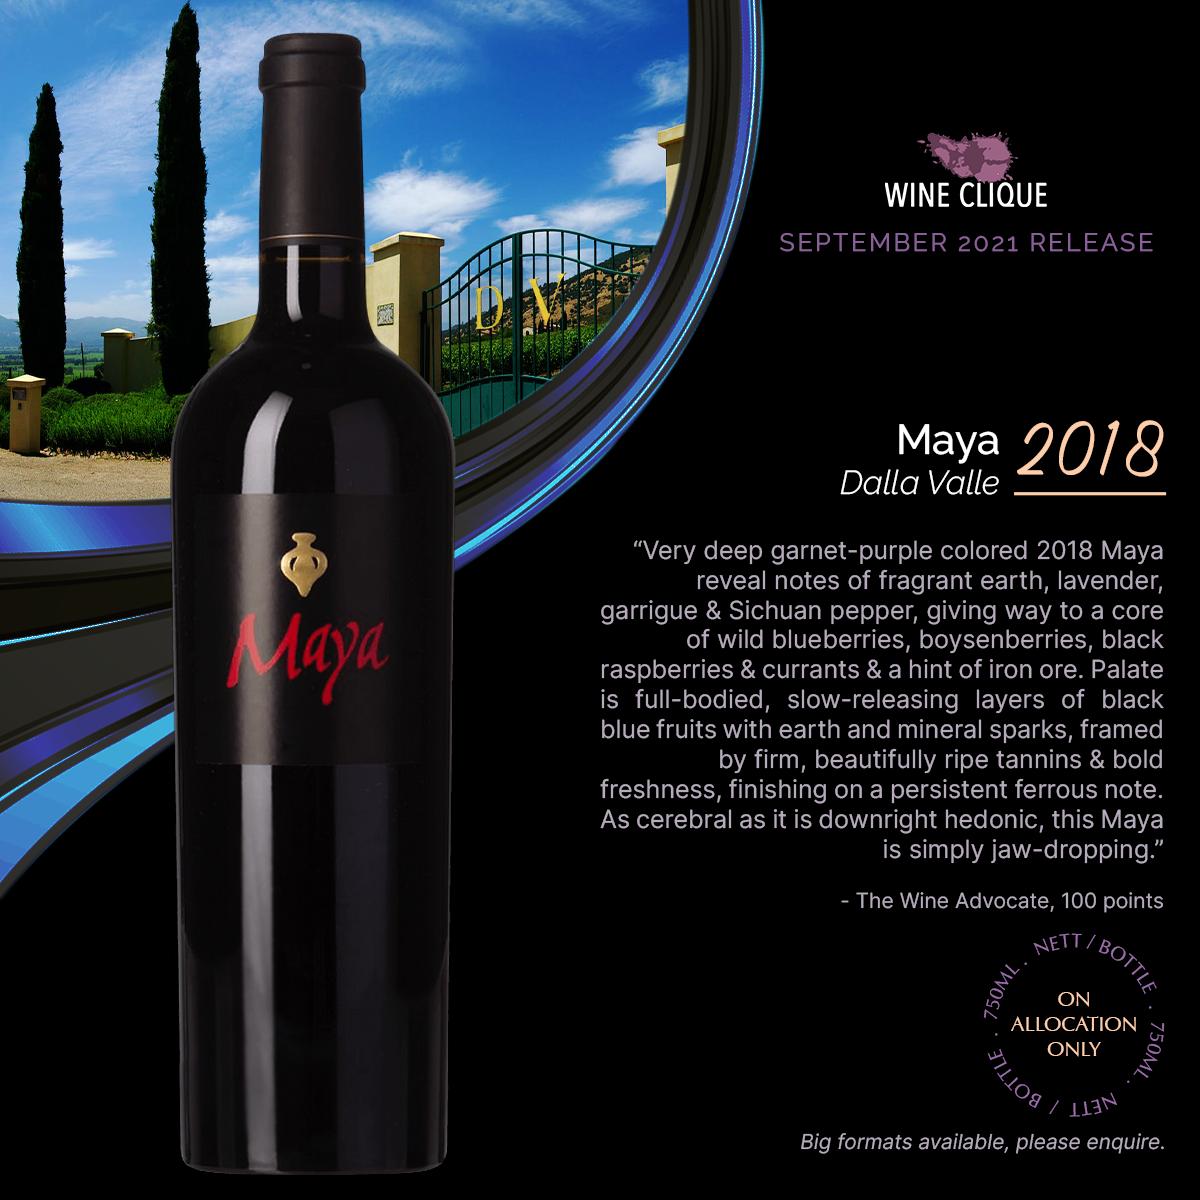 September 2021 Release: Caiarossa, Dalla Valle Maya